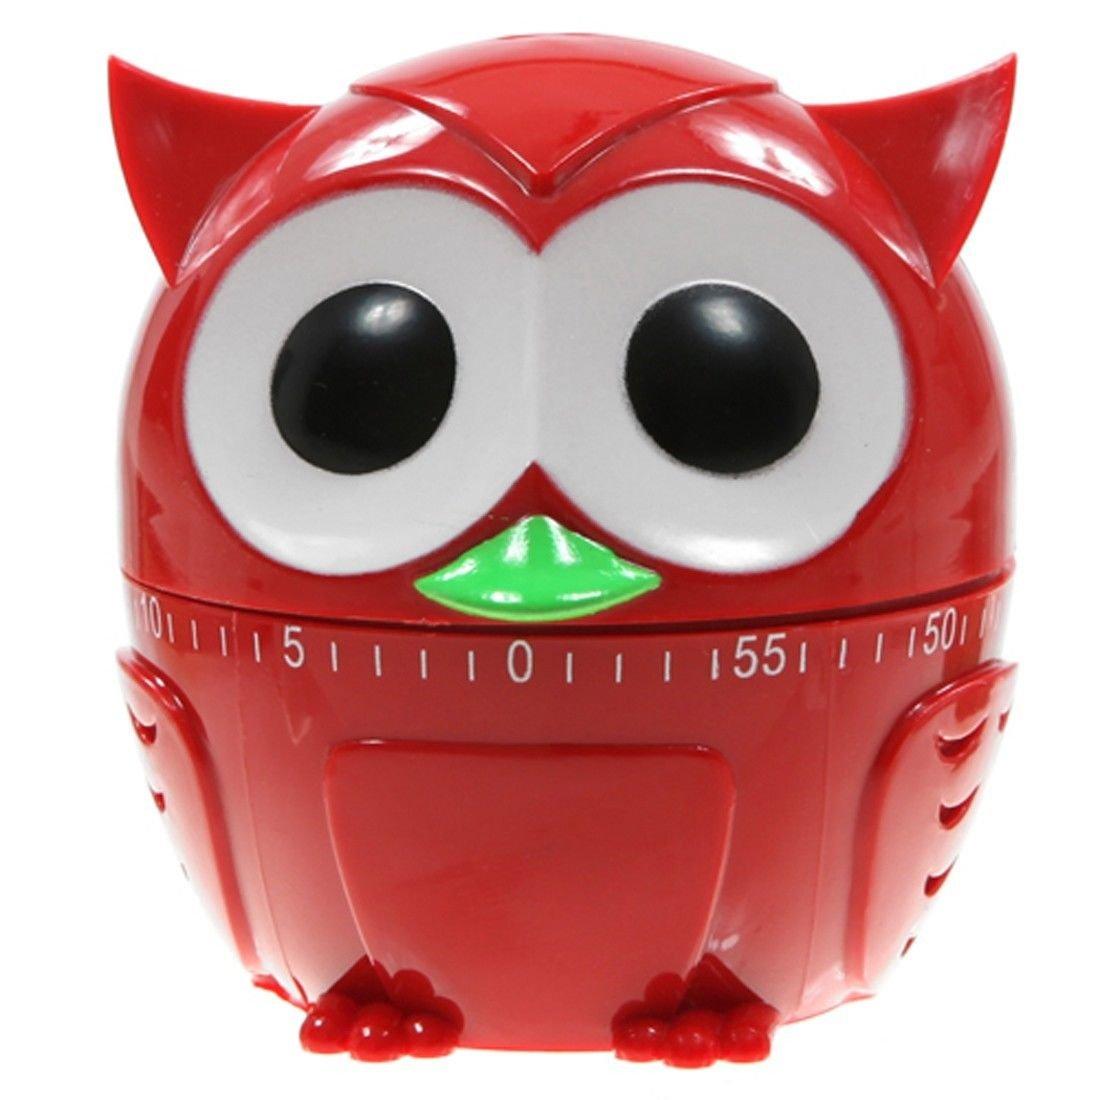 Amazon.com: Kikkerland Owlet Kitchen Timer, 60 Minutes, Assorted Colors, 1  Piece: Owl Cookie Jar: Kitchen U0026 Dining